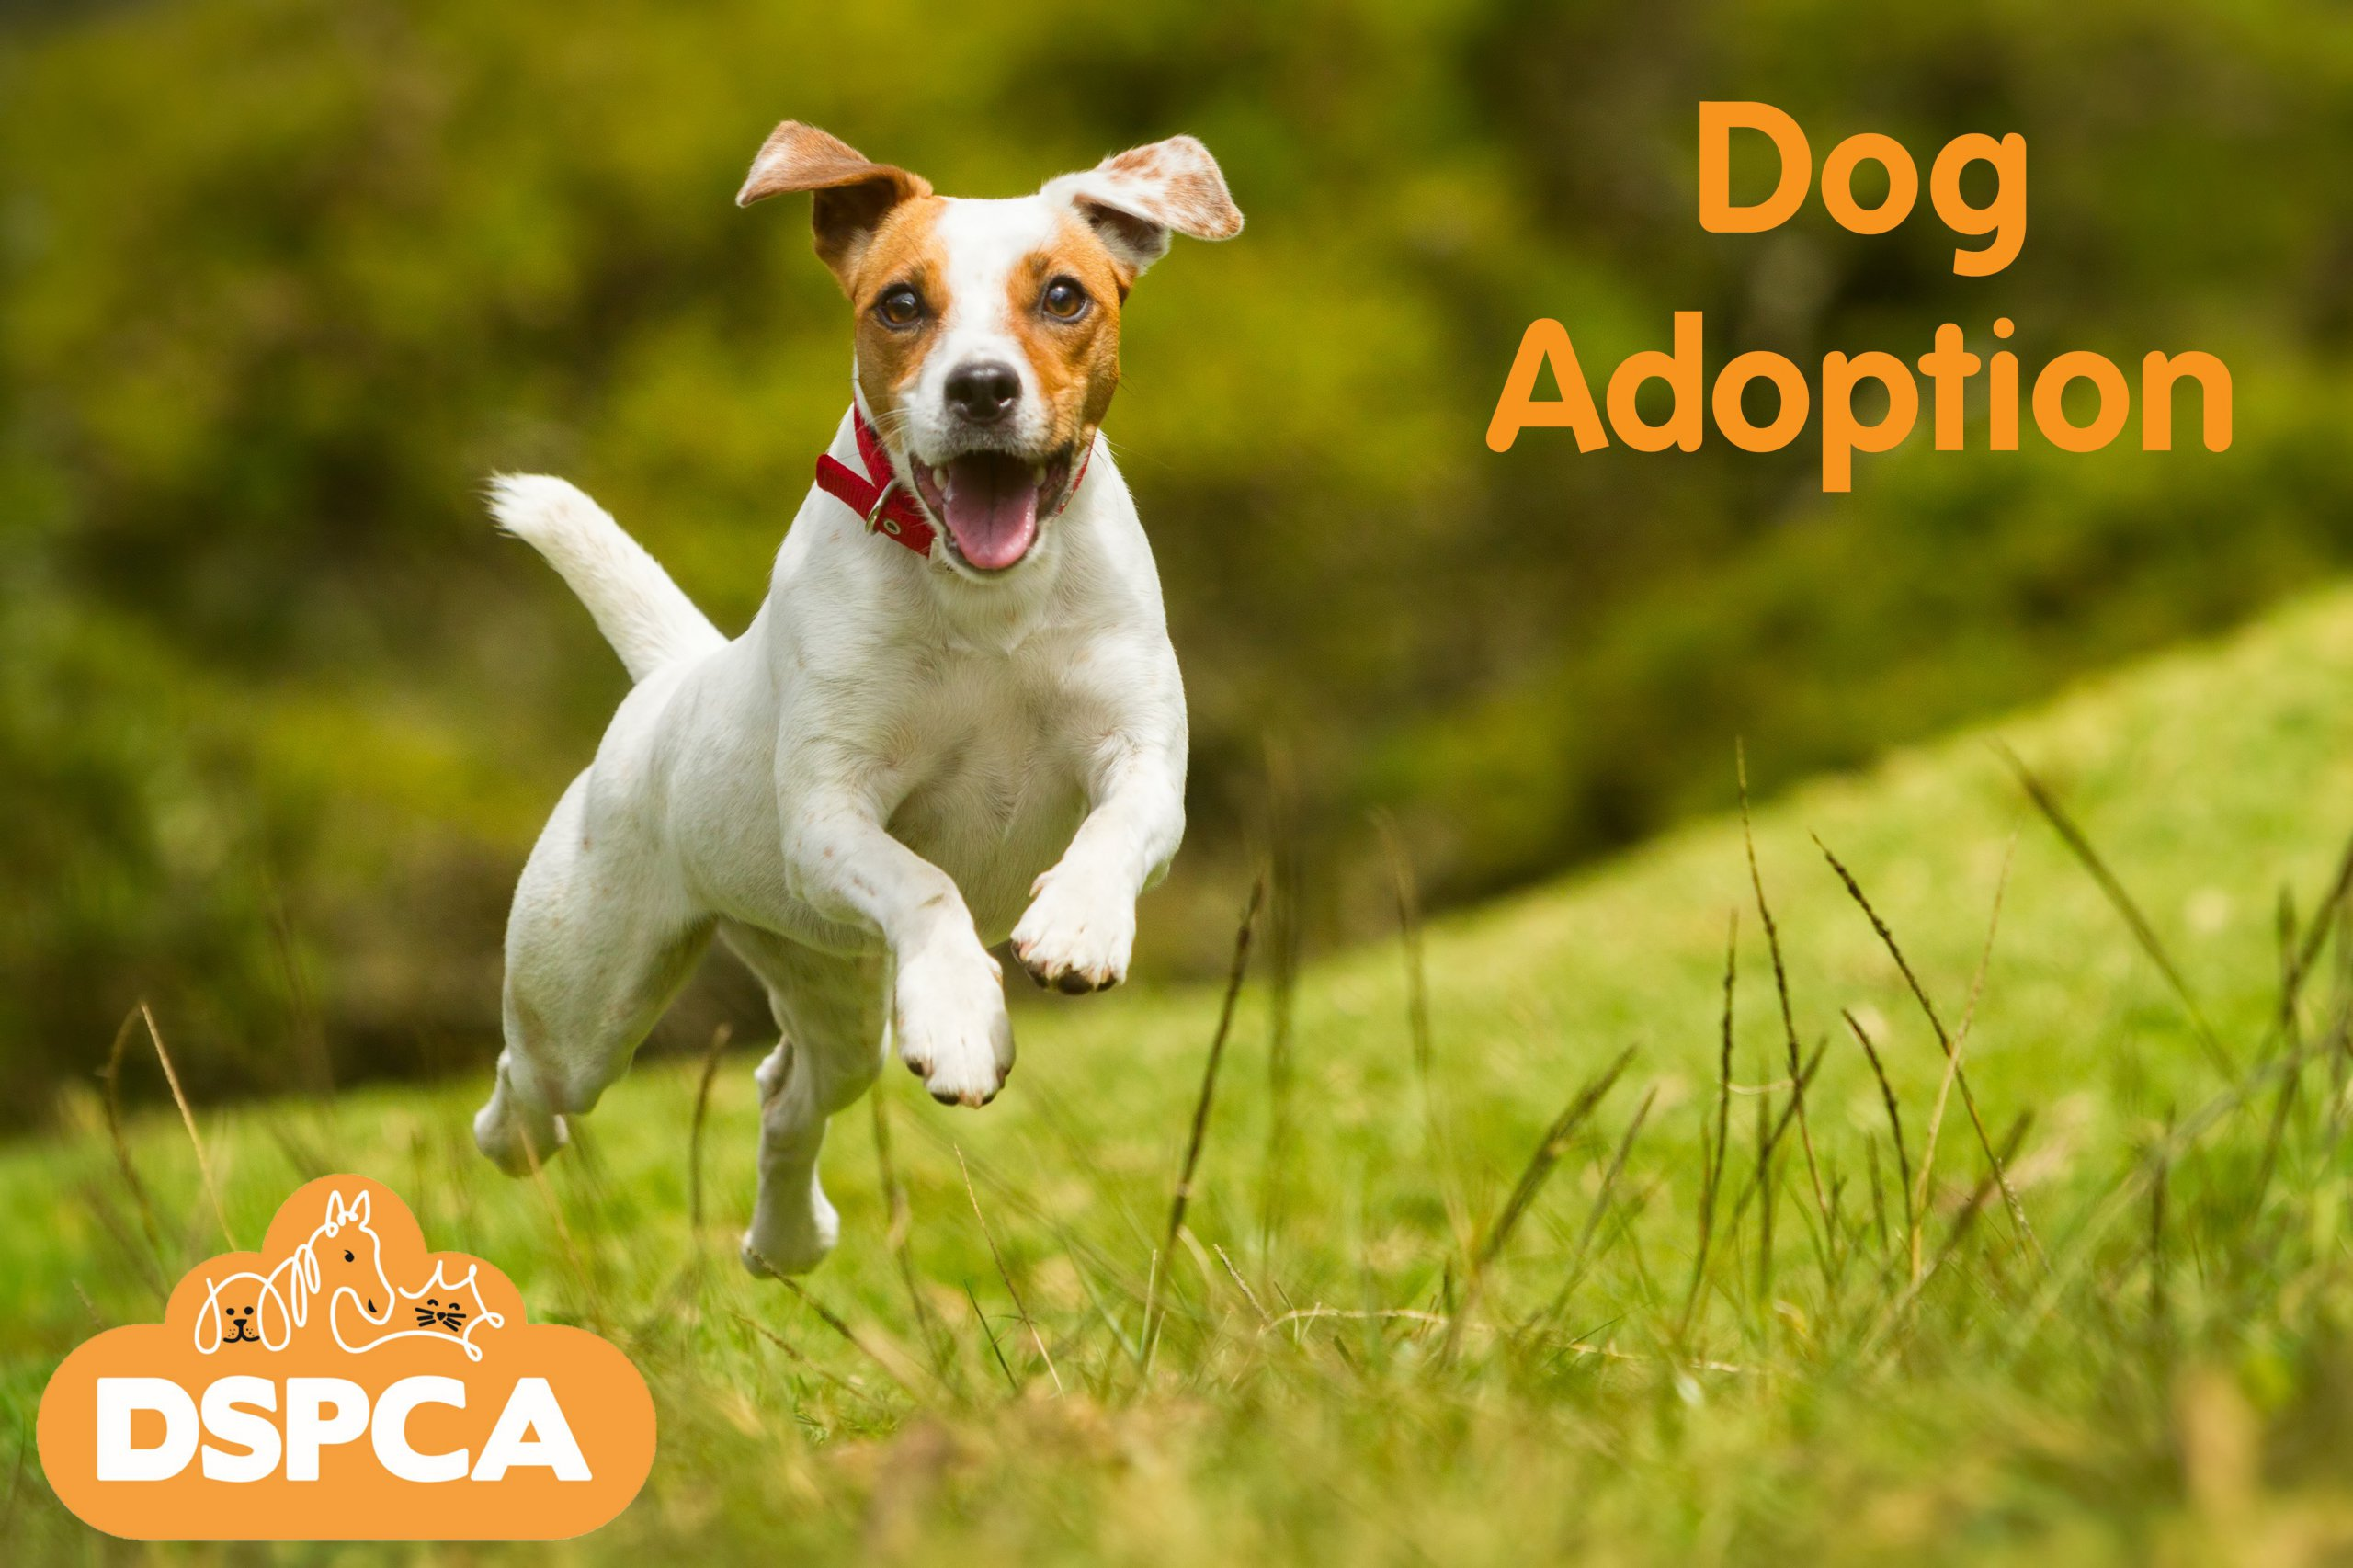 DSPCA Dog Adoption